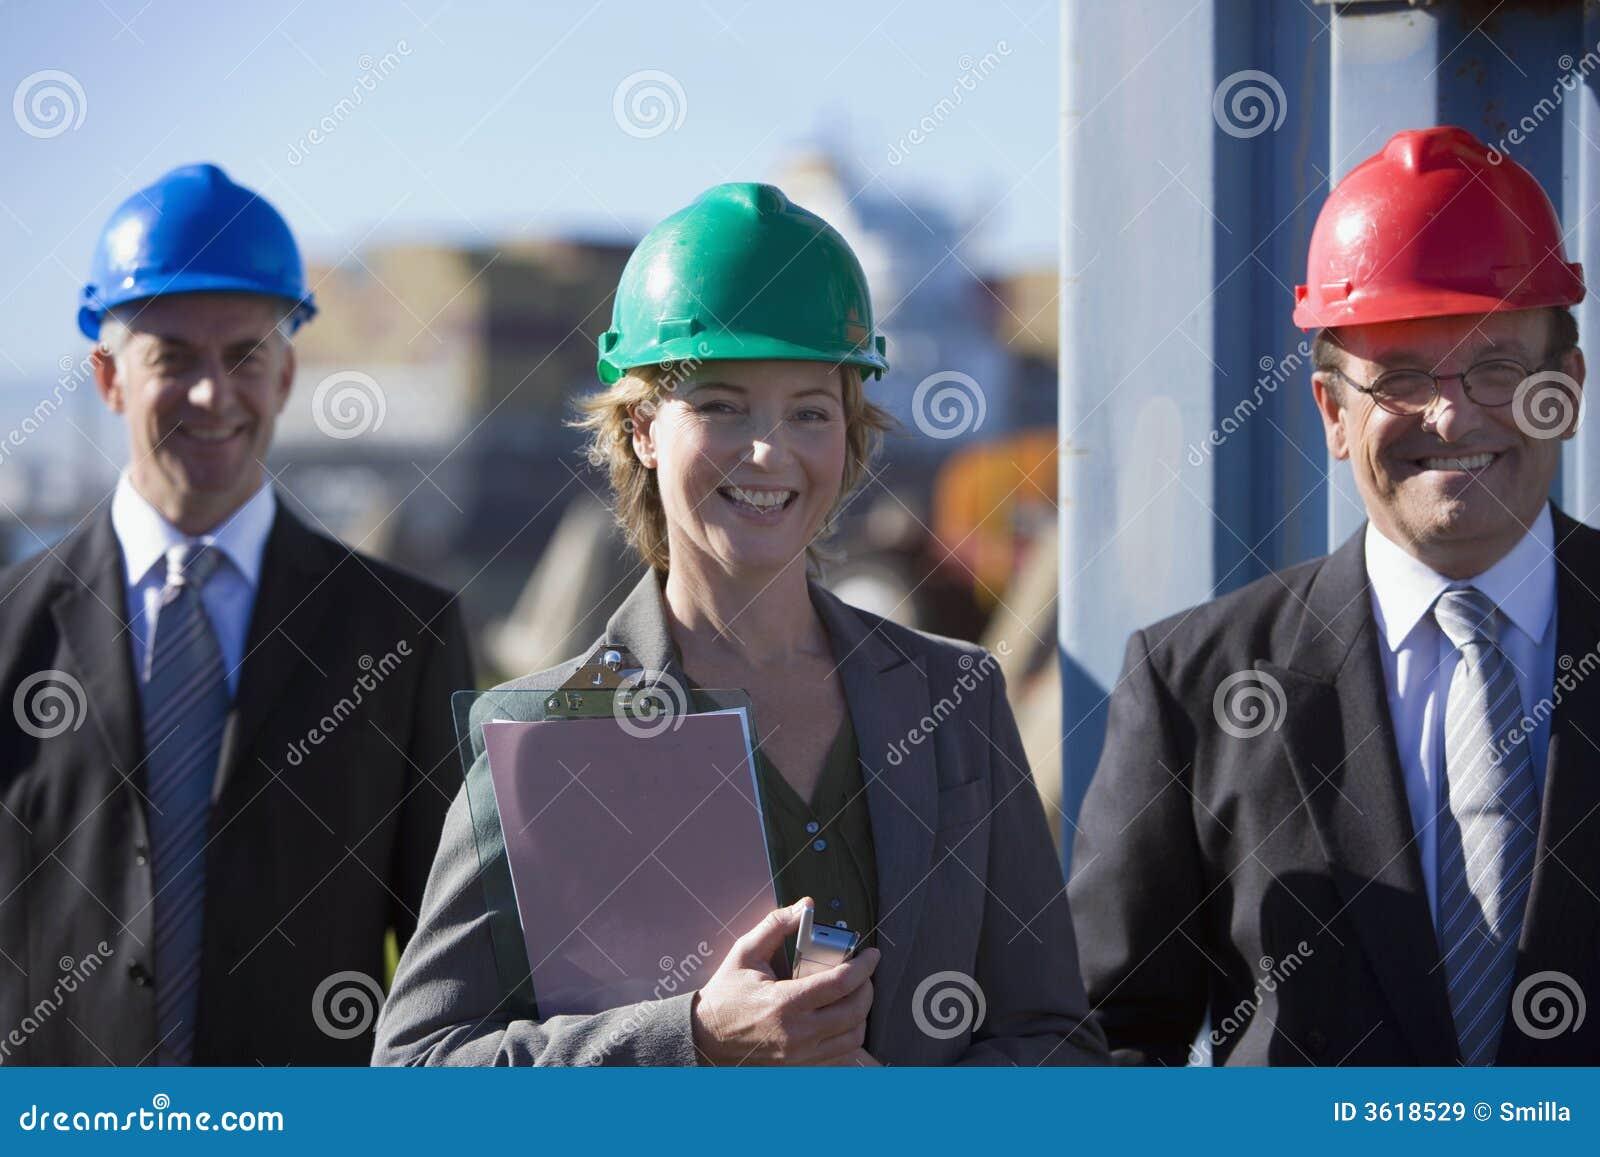 An engineering team on survey